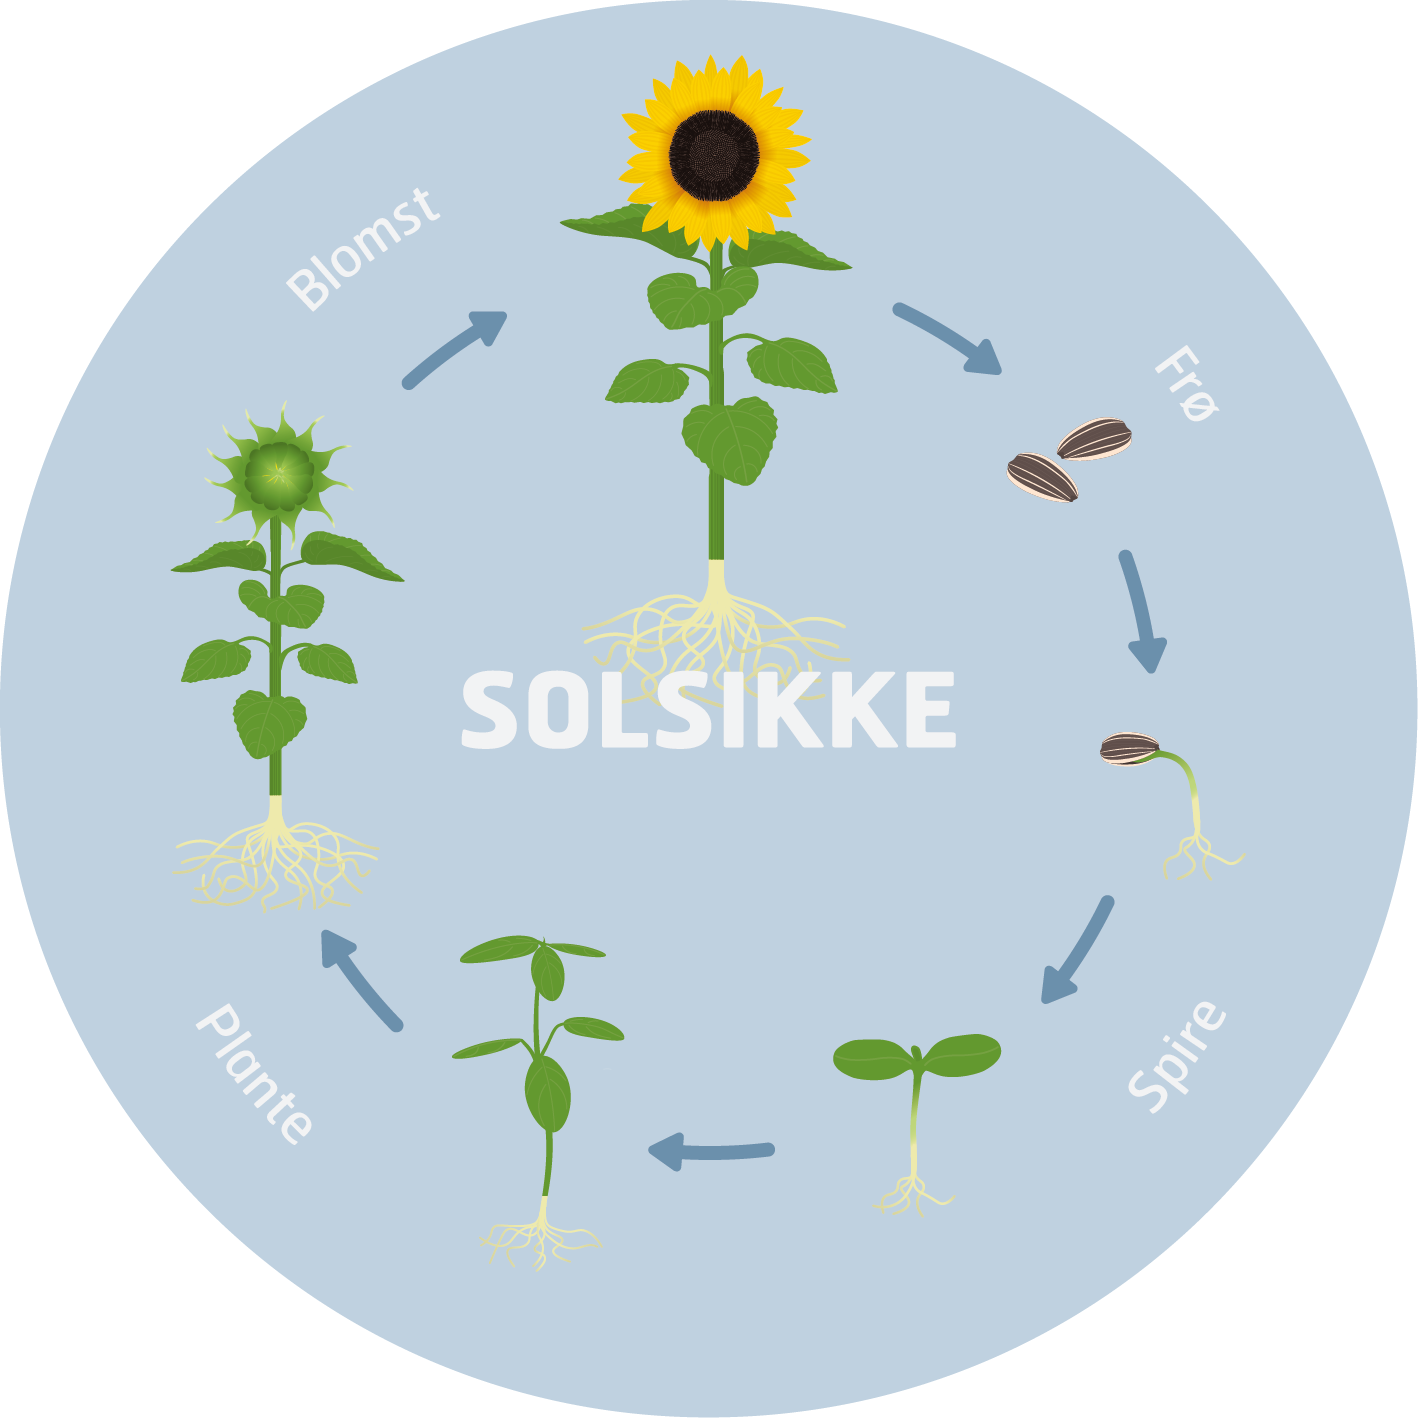 solsikken-solsikke-cyklus-plante-mutedesign